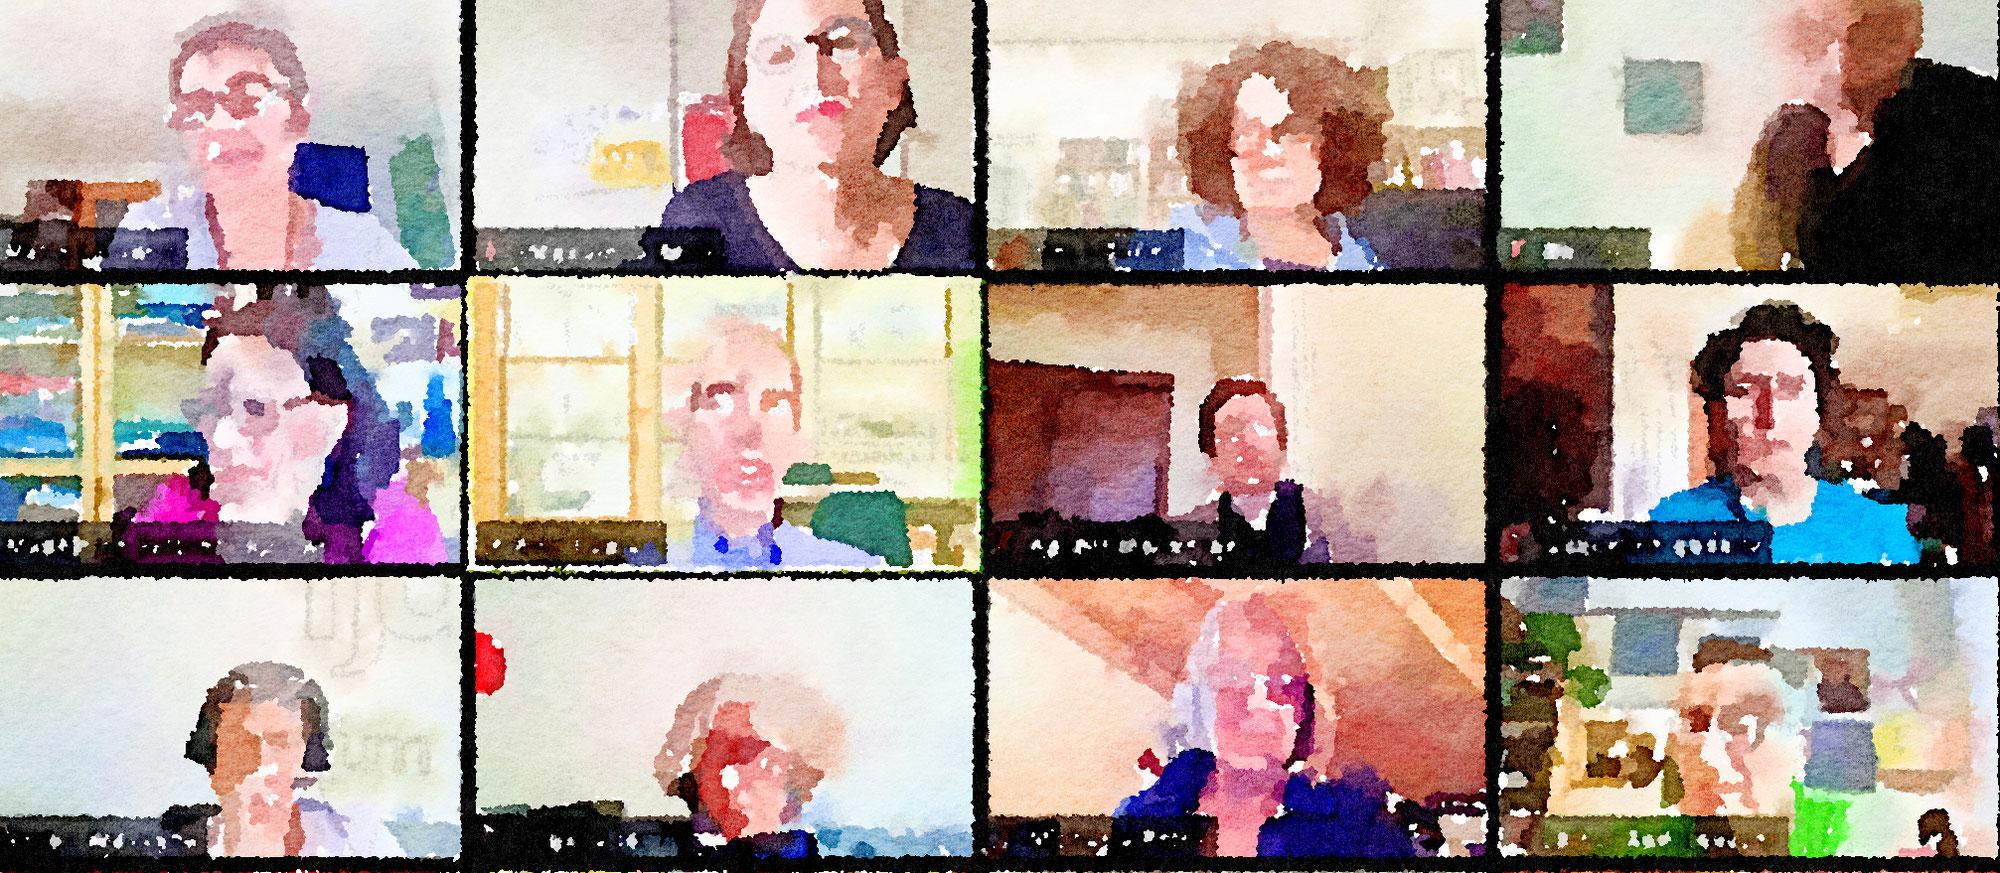 10 Vorurteile über Videomeetings